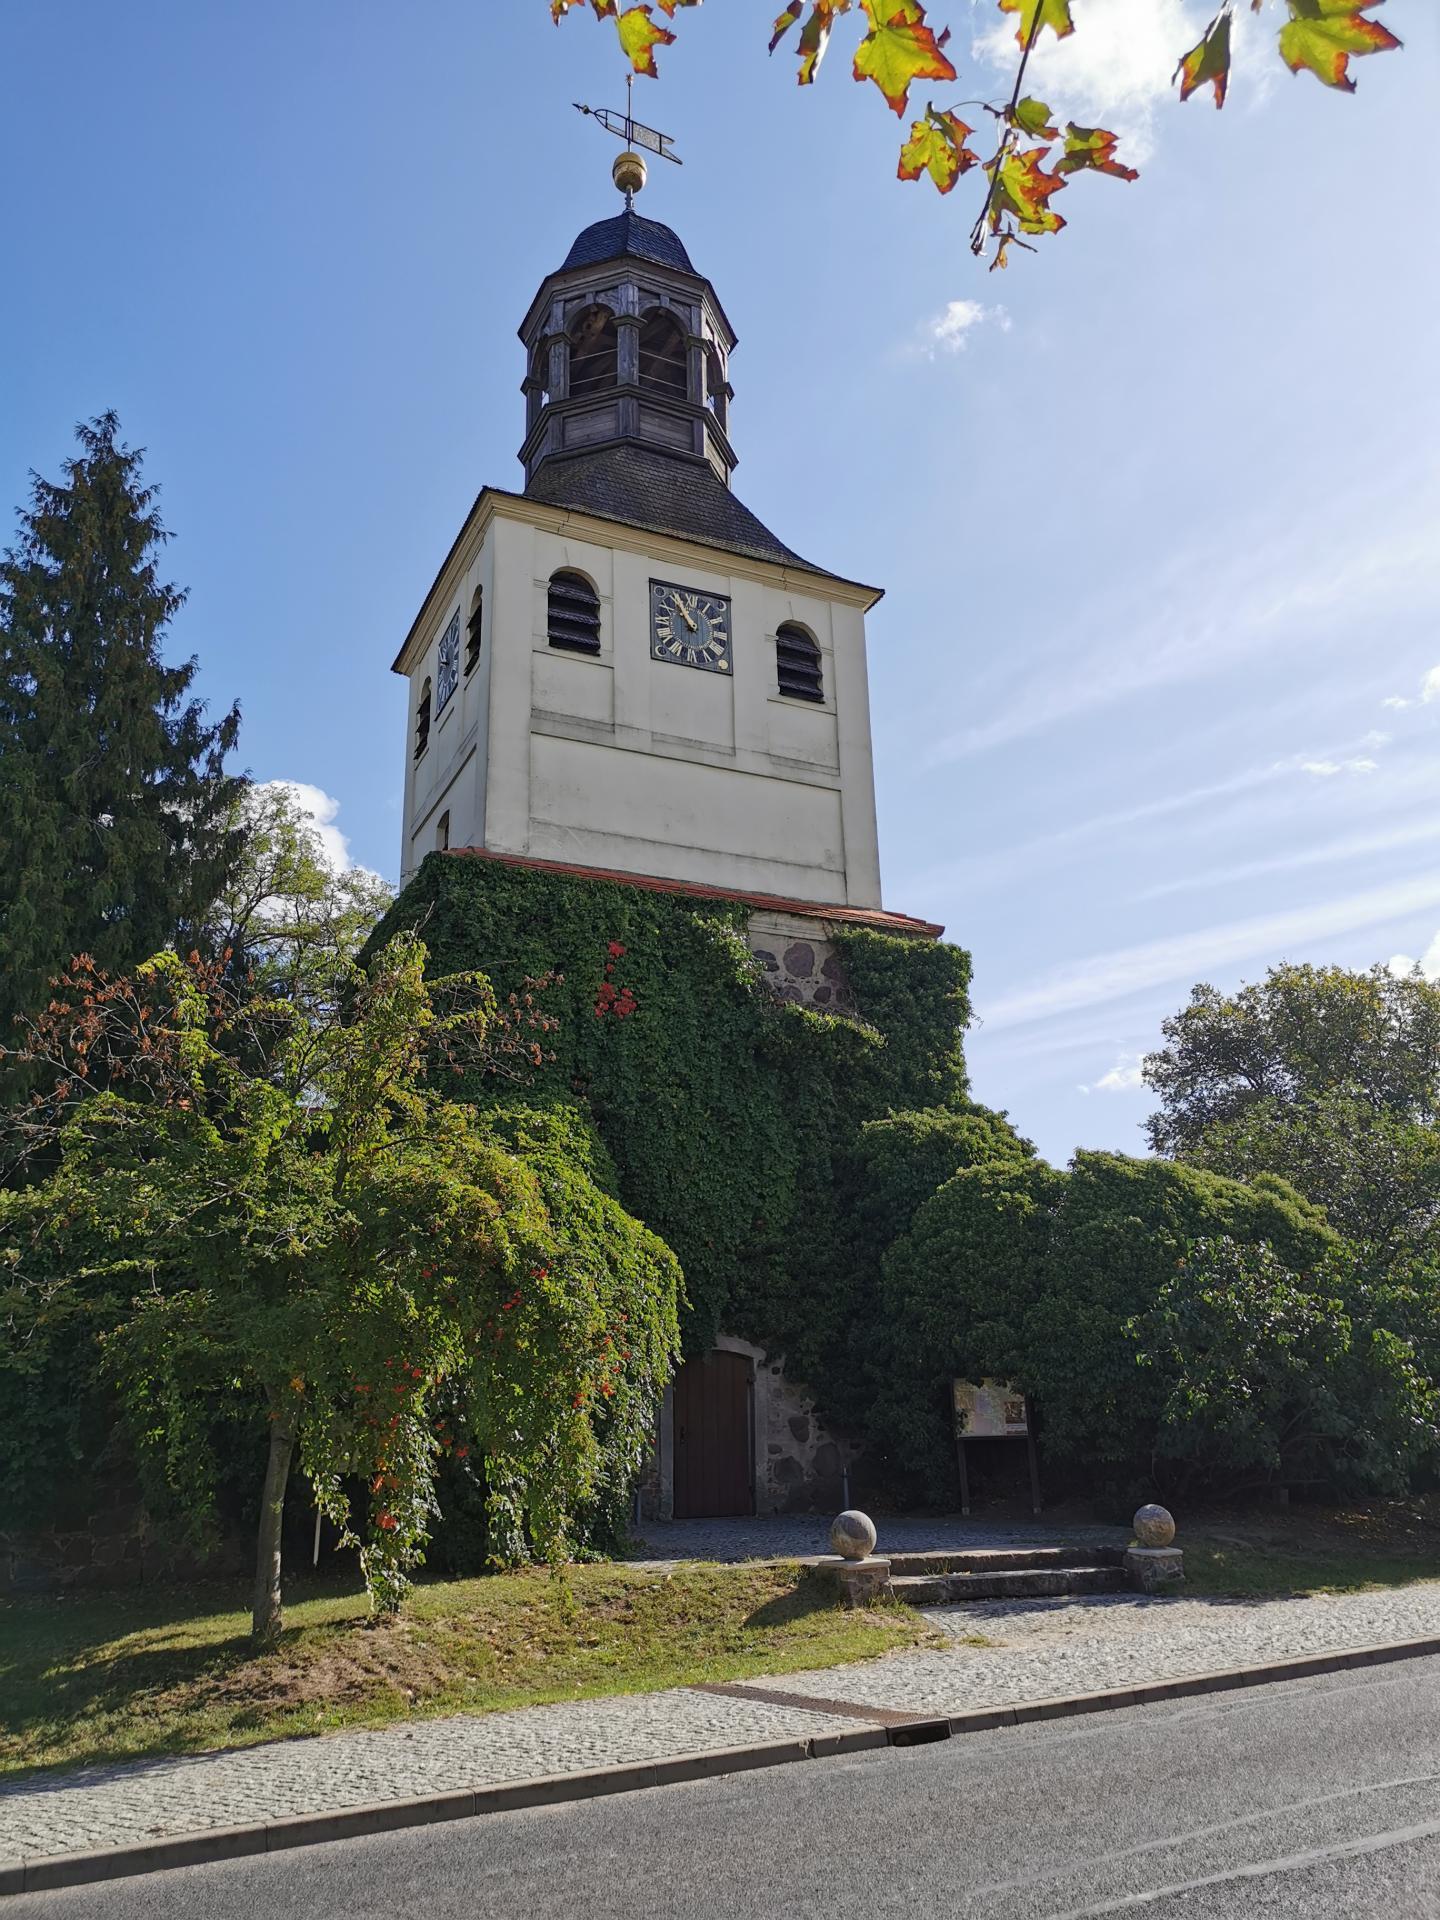 Barockkirche Friedersdorf